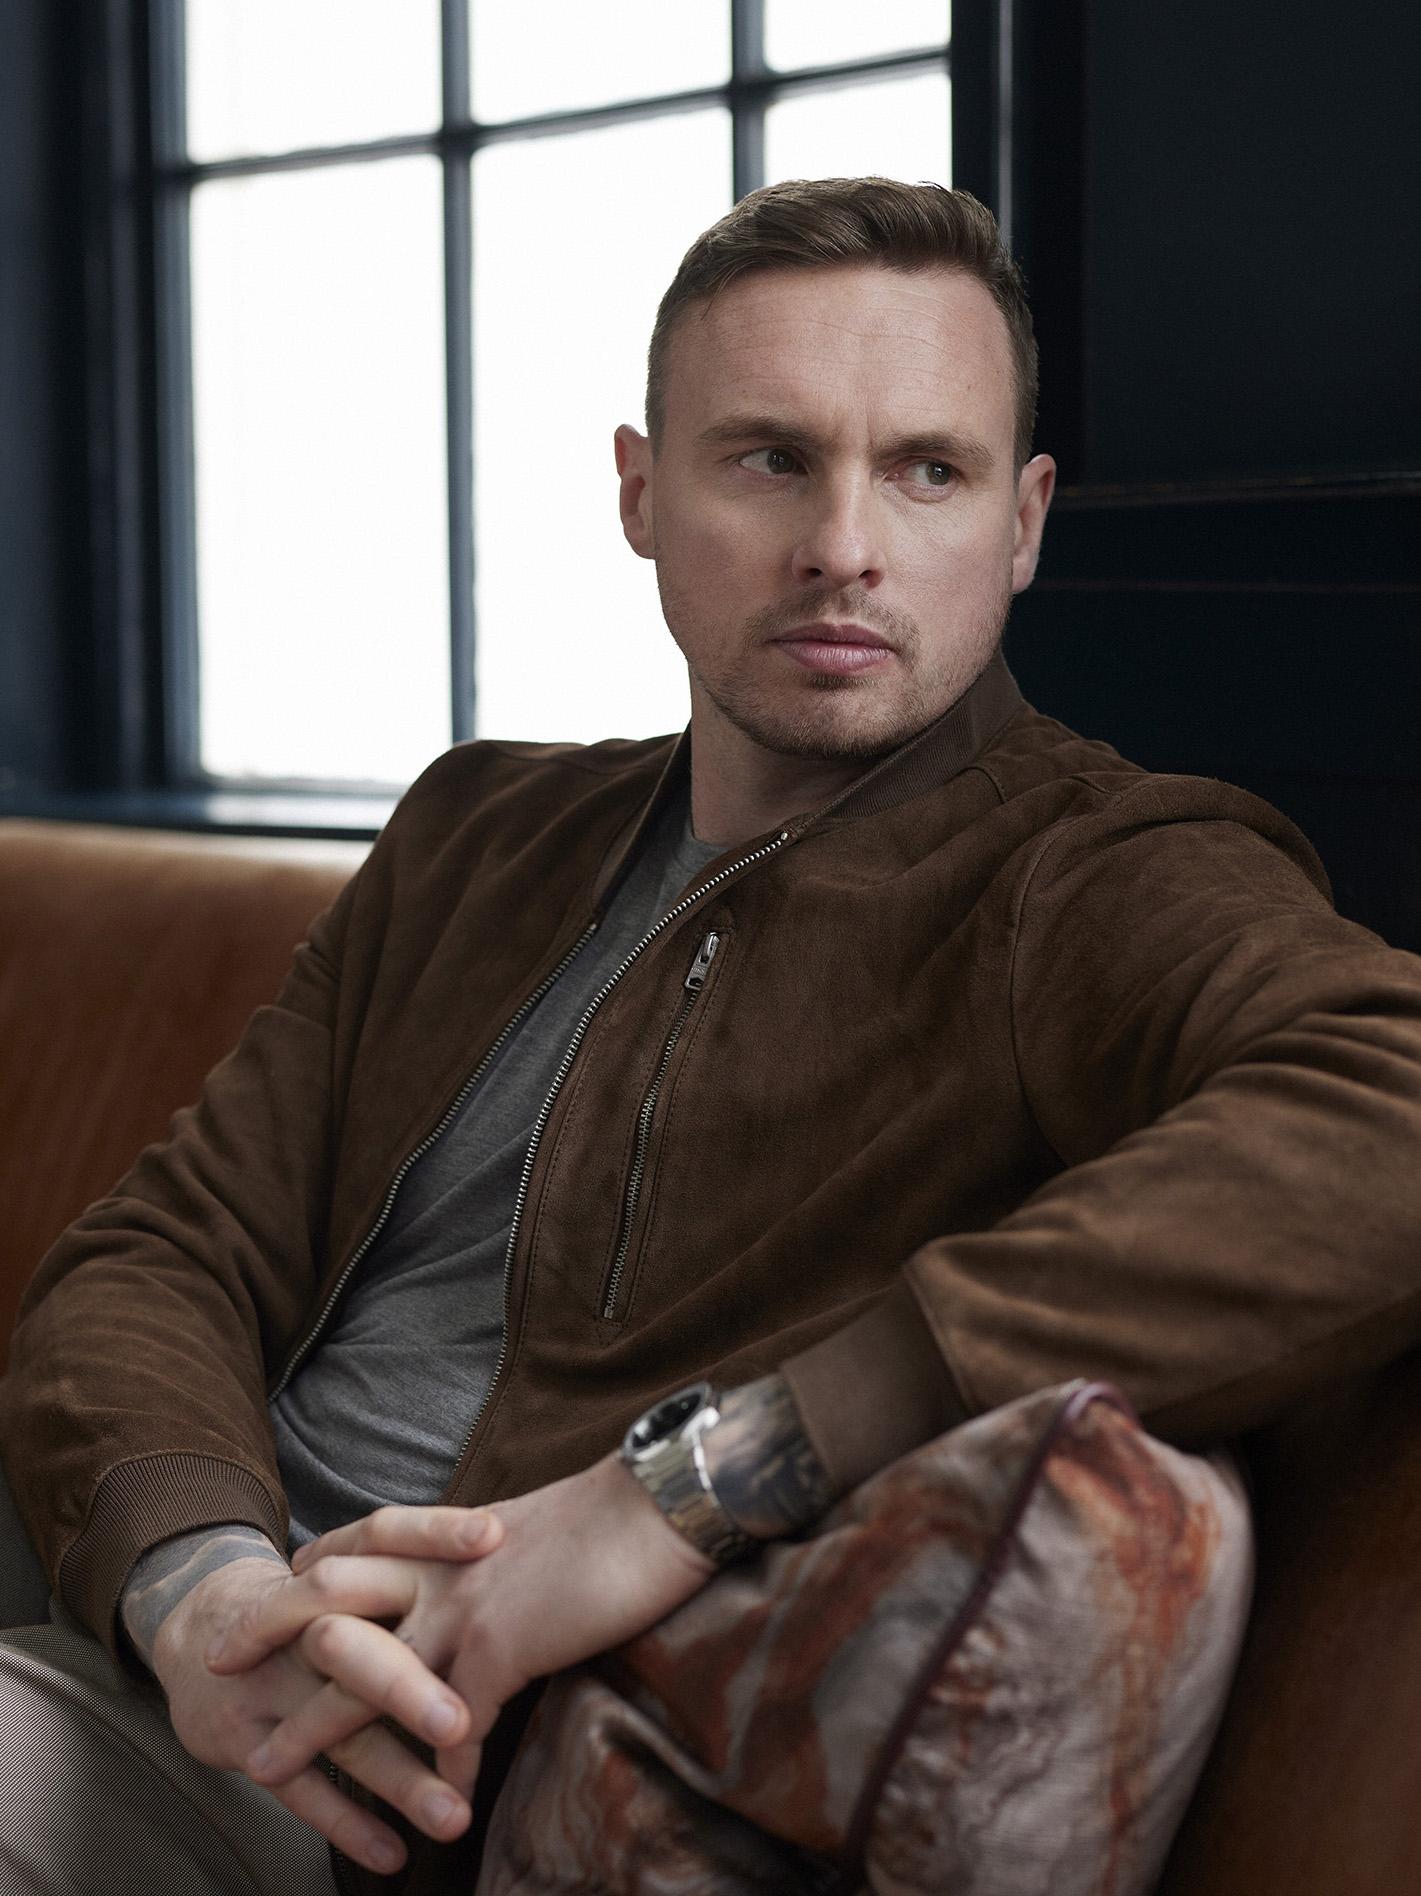 David Stockdale sitting on a leather sofa